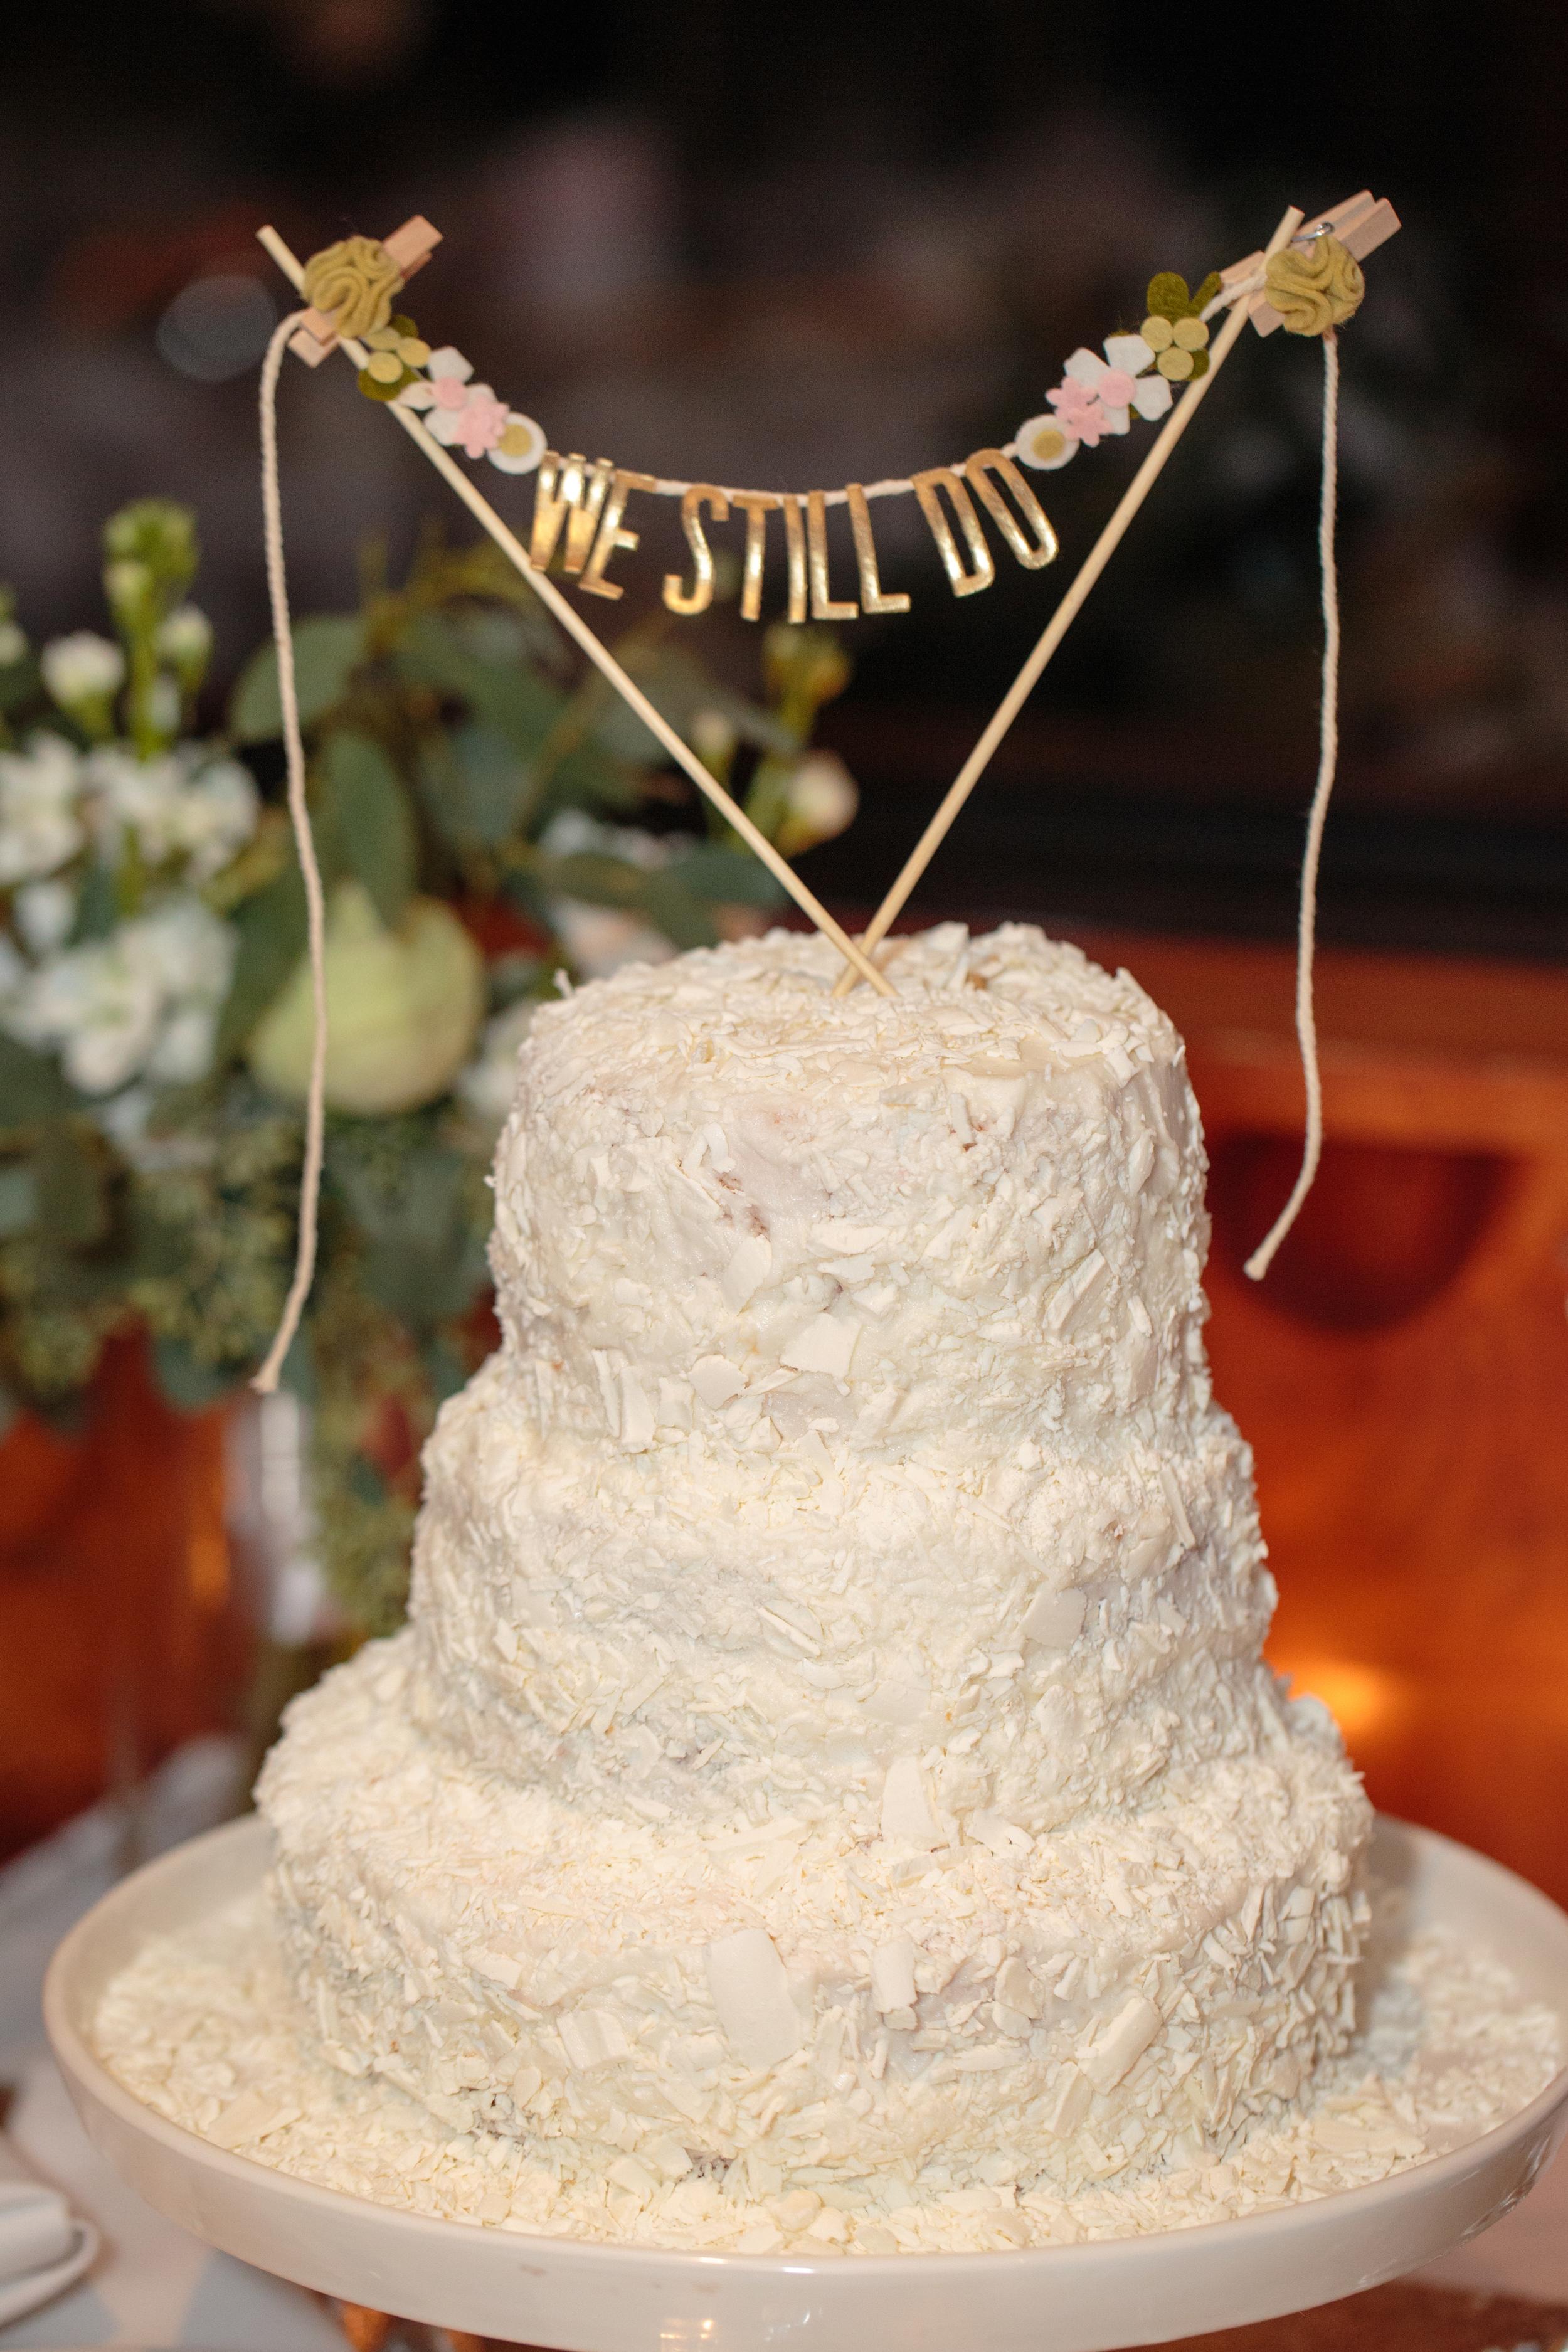 We (Still) Do: Liberty Mountain Resort Wedding Vow Renewal | Shotgunning for Love Letters | We Still Do Cake Topper